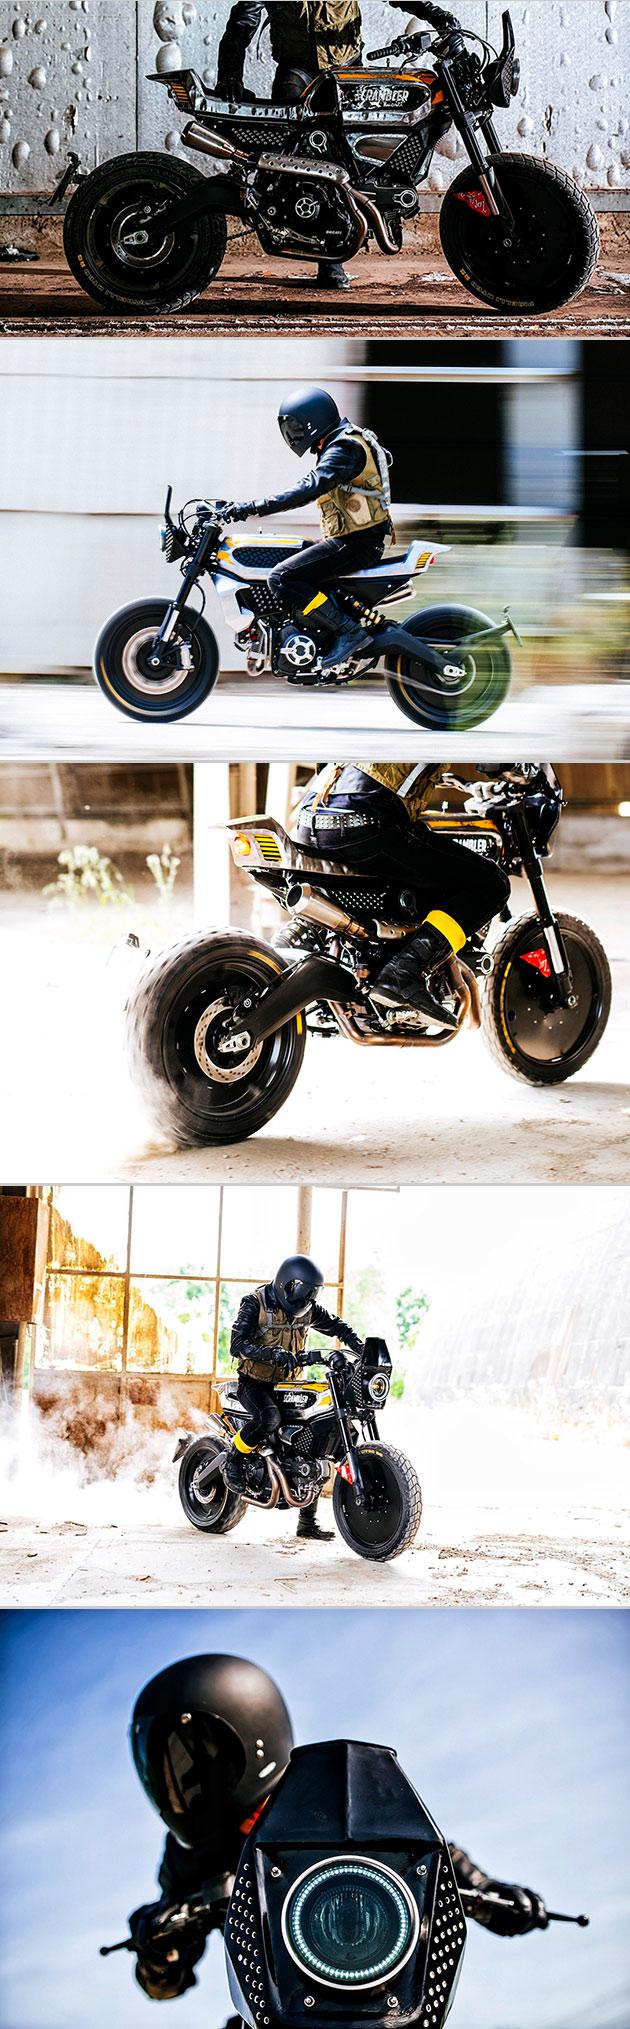 Pirelli Ducati SC-Rumble